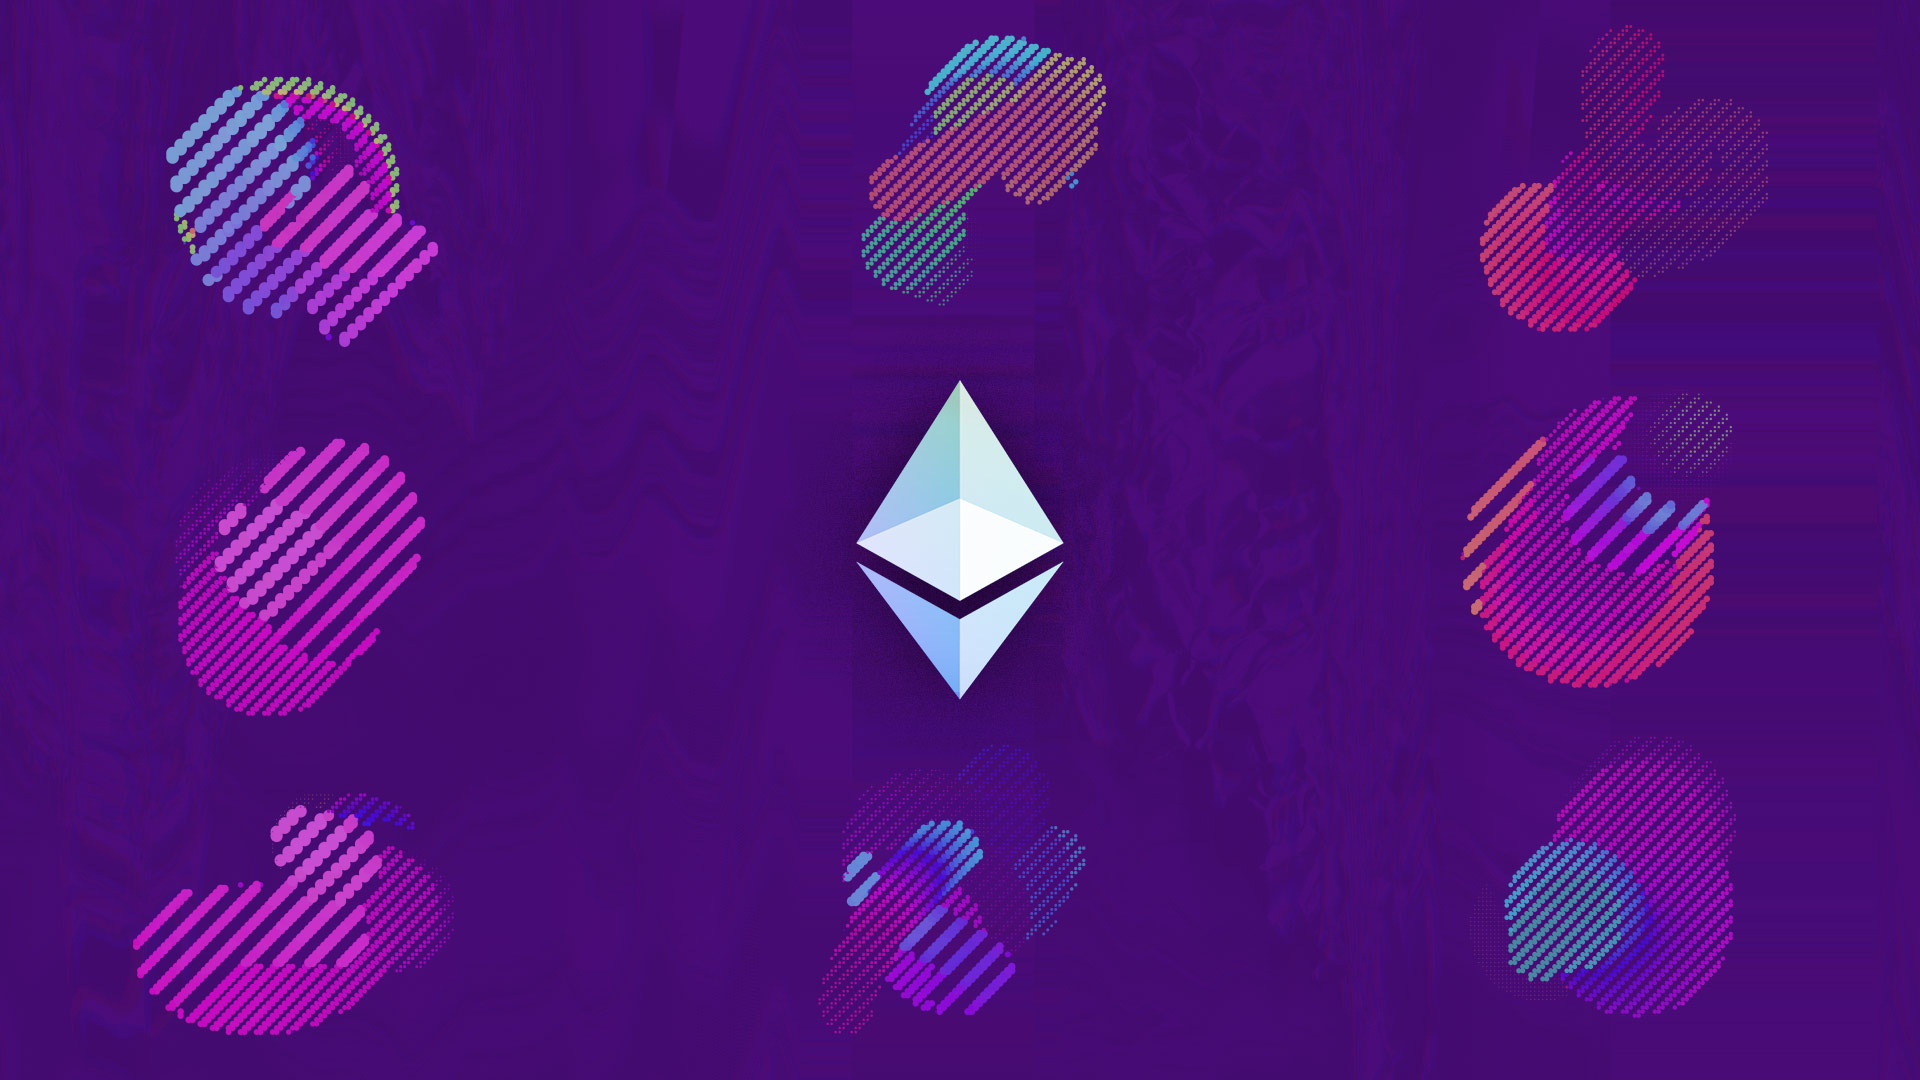 Ethereum-compatible developer platform Aurora raises $12 million